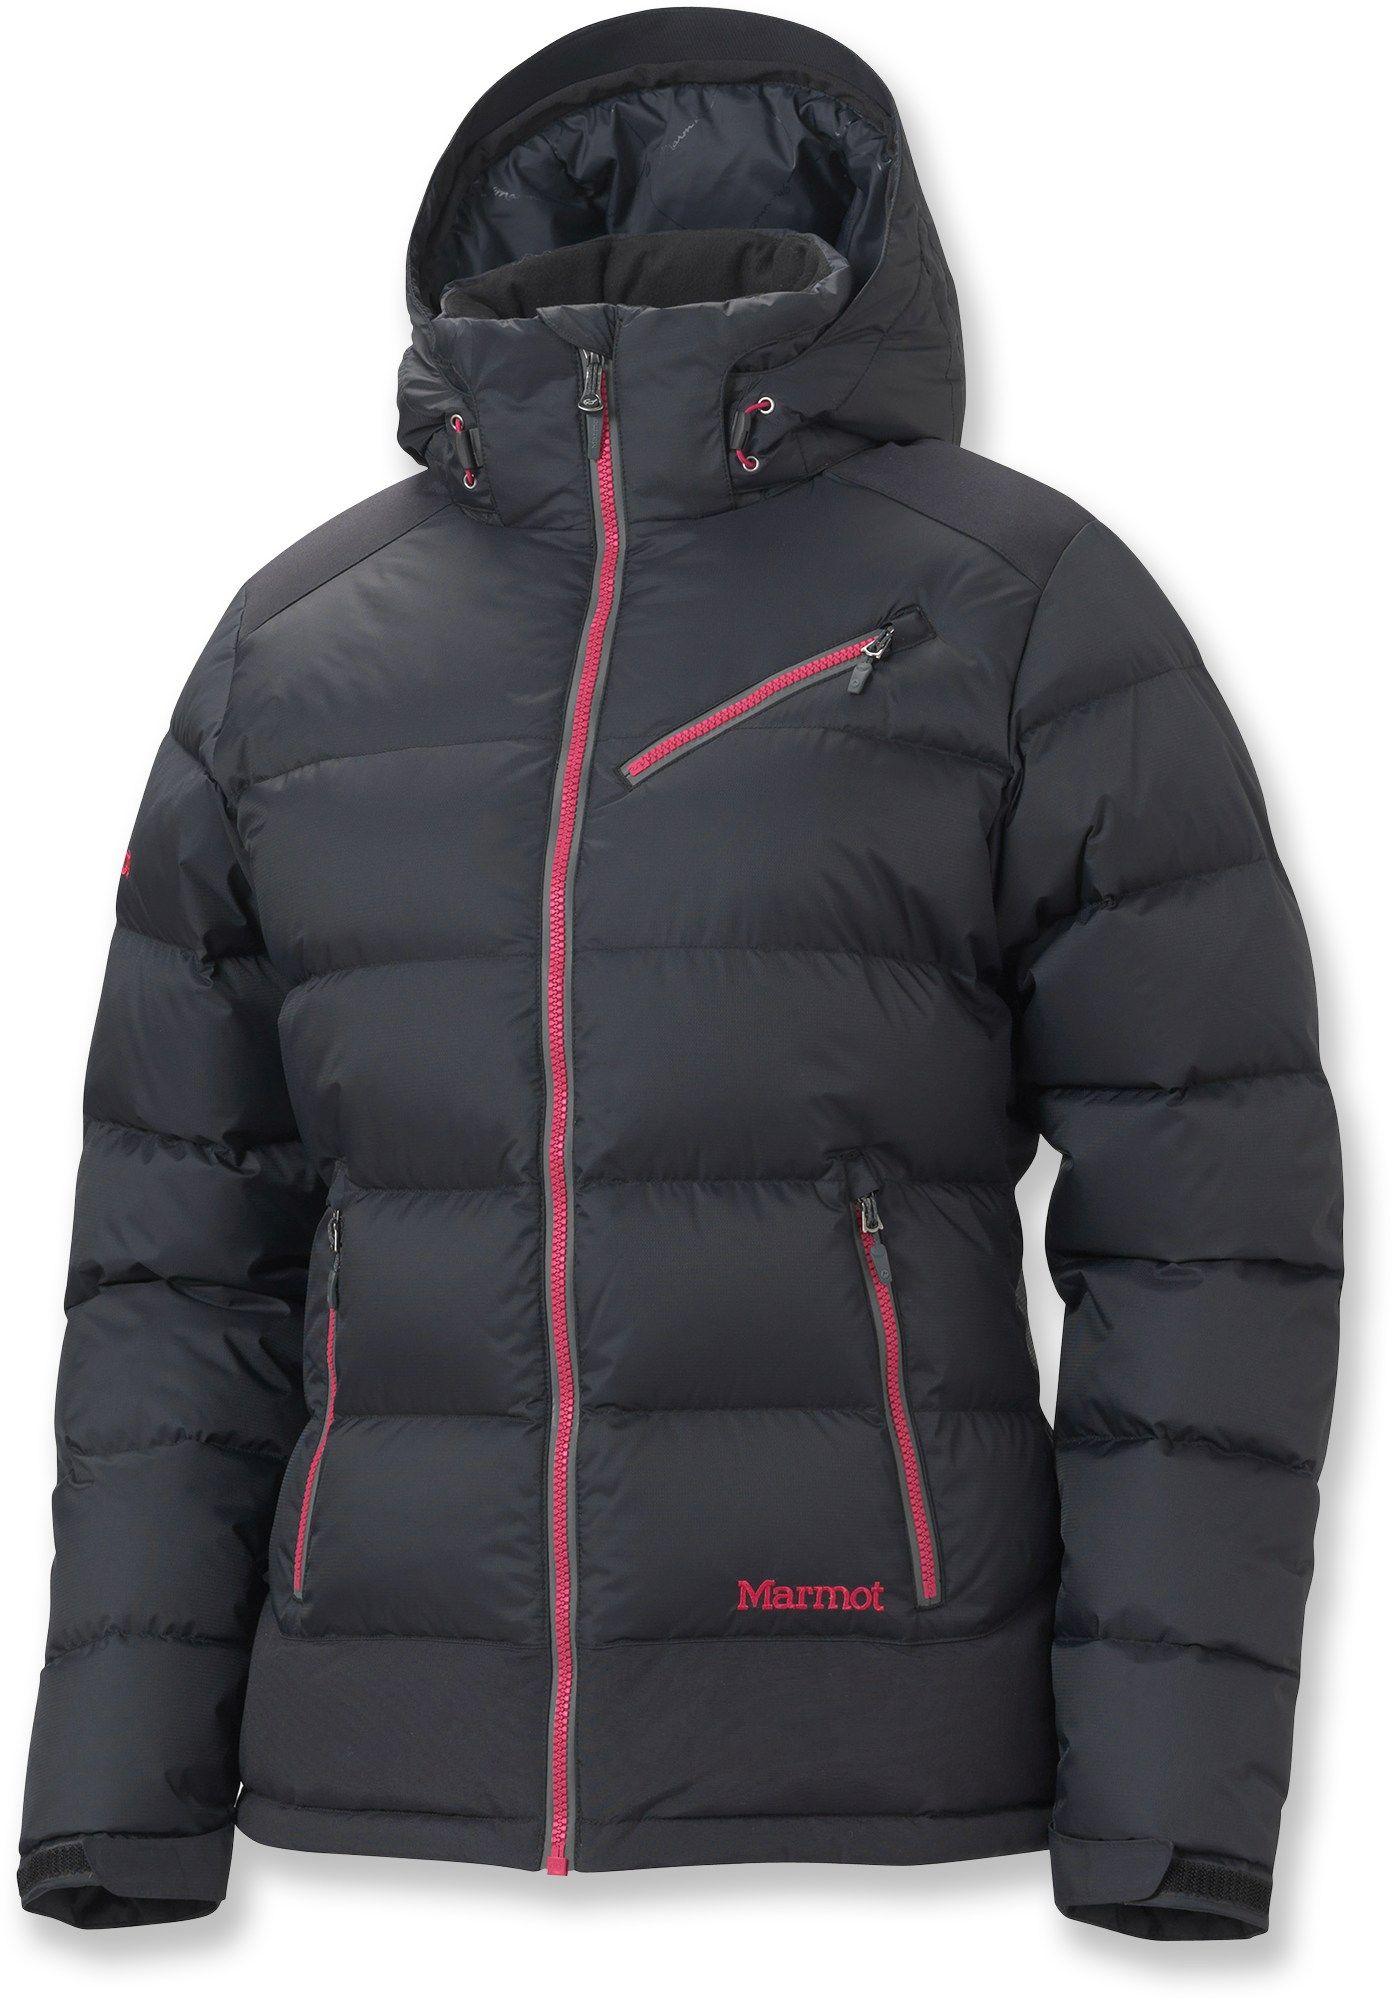 Marmot Sling Shot Insulated Down Jacket - Women's - Free Shipping at REI.com